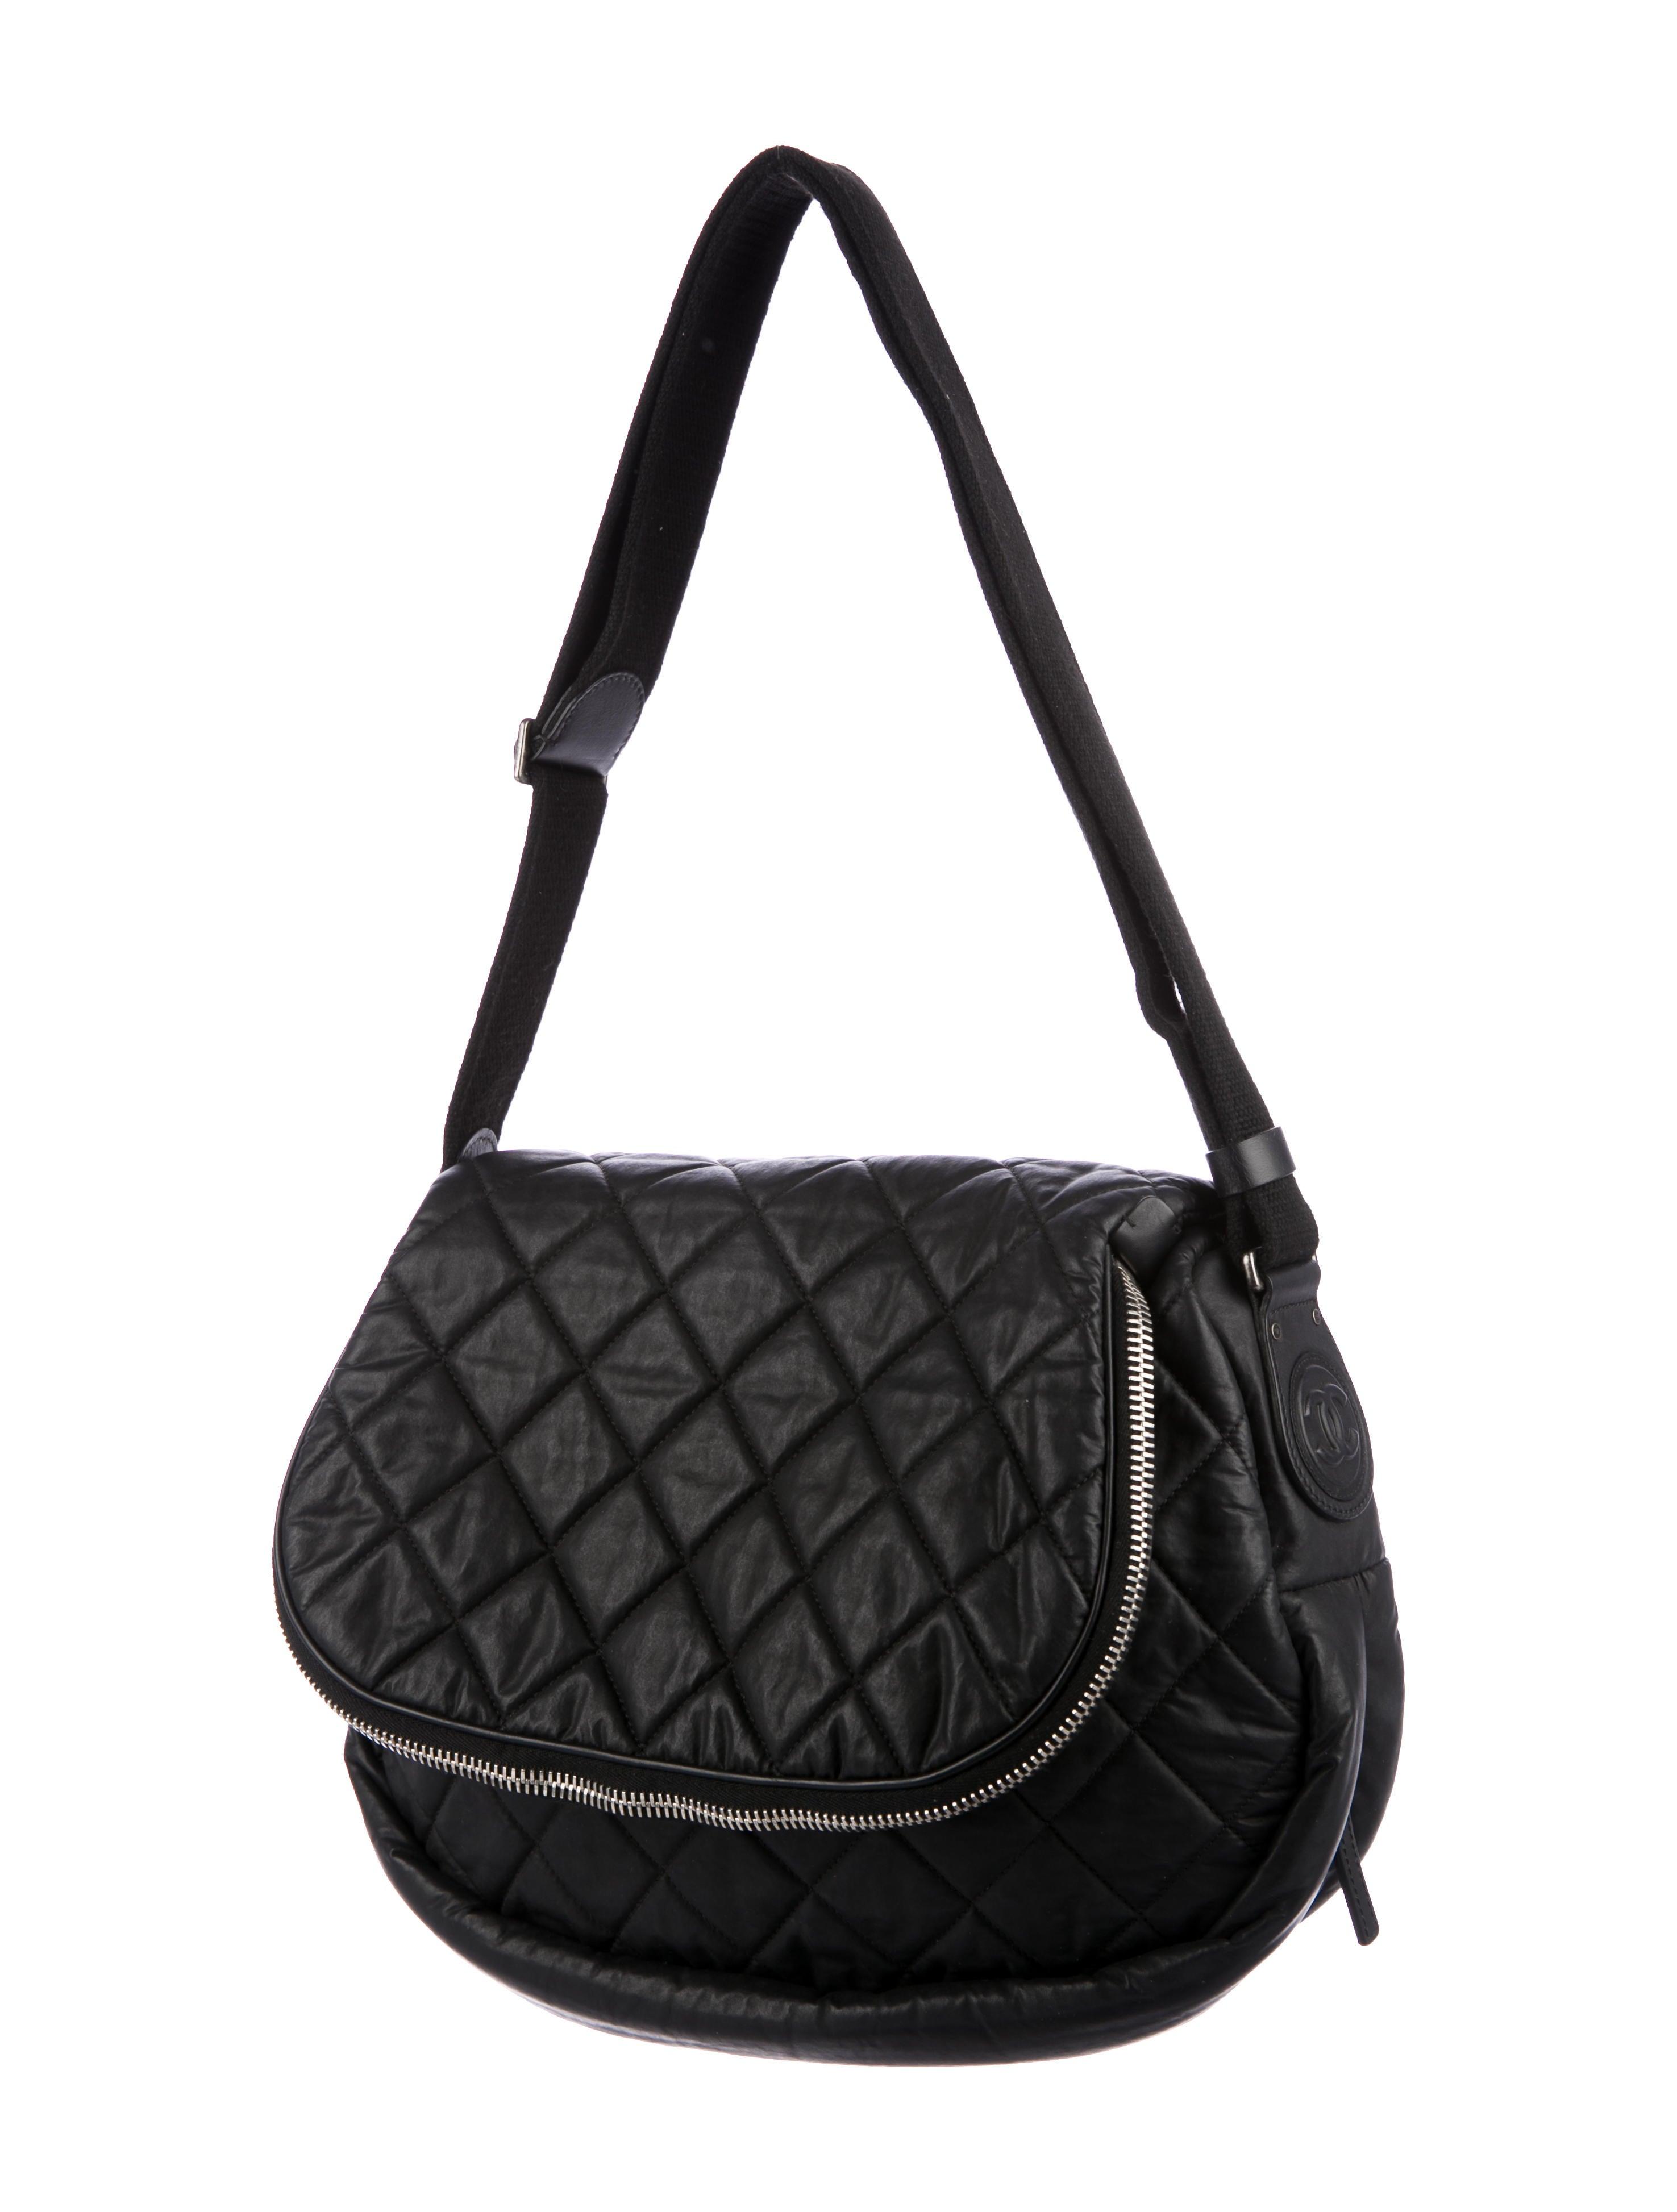 Chanel Coated Canvas Expandable Messenger Bag - Handbags - CHA226764 ... 315d90f1f02a0